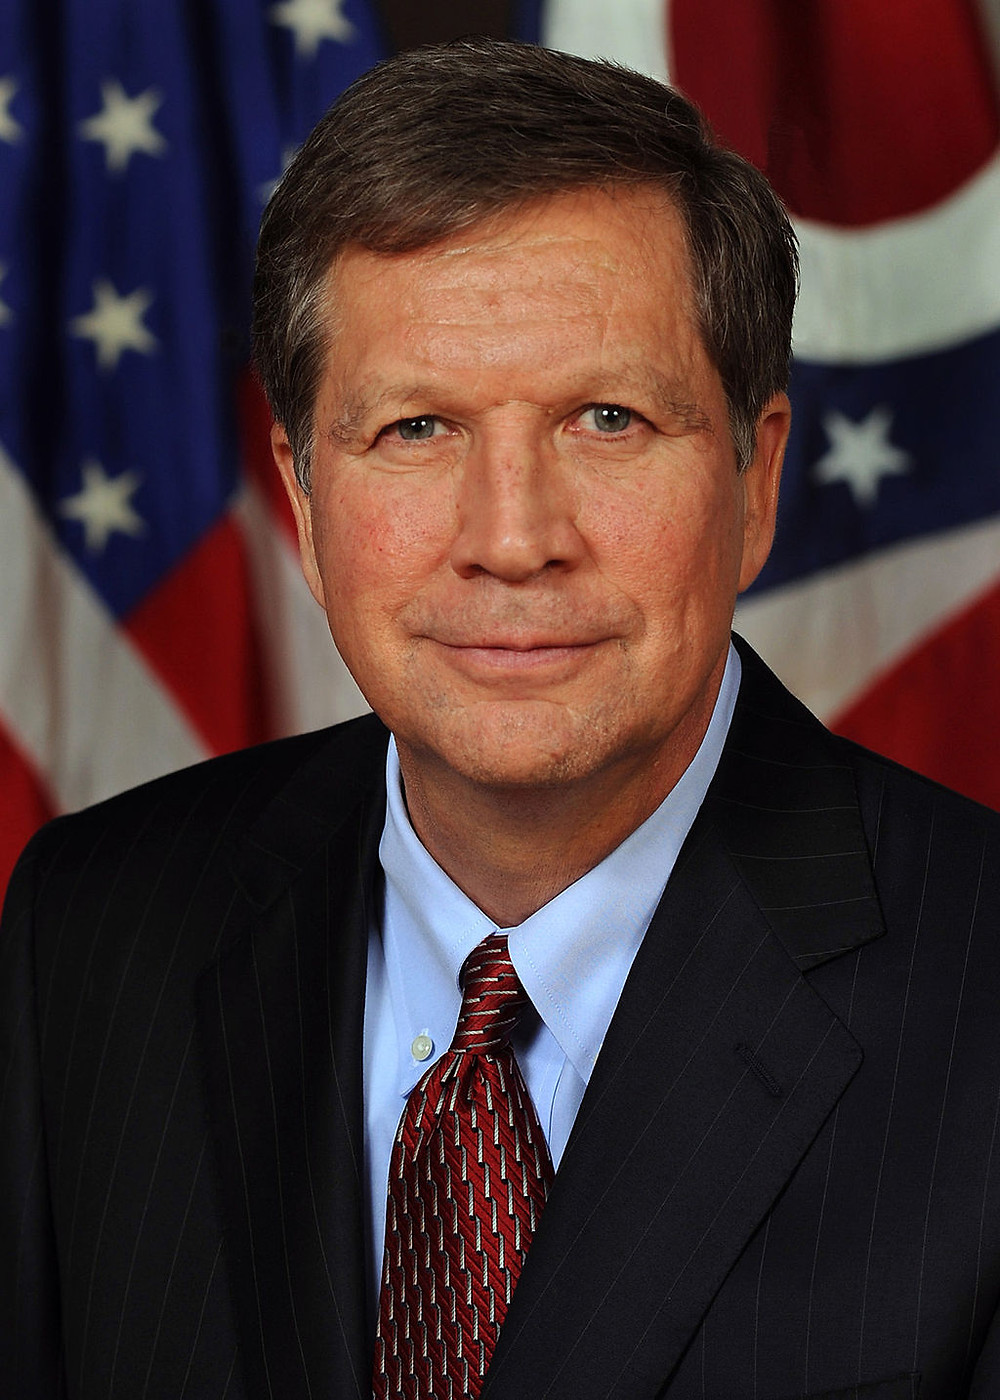 1024px-Governor_John_Kasich.jpg